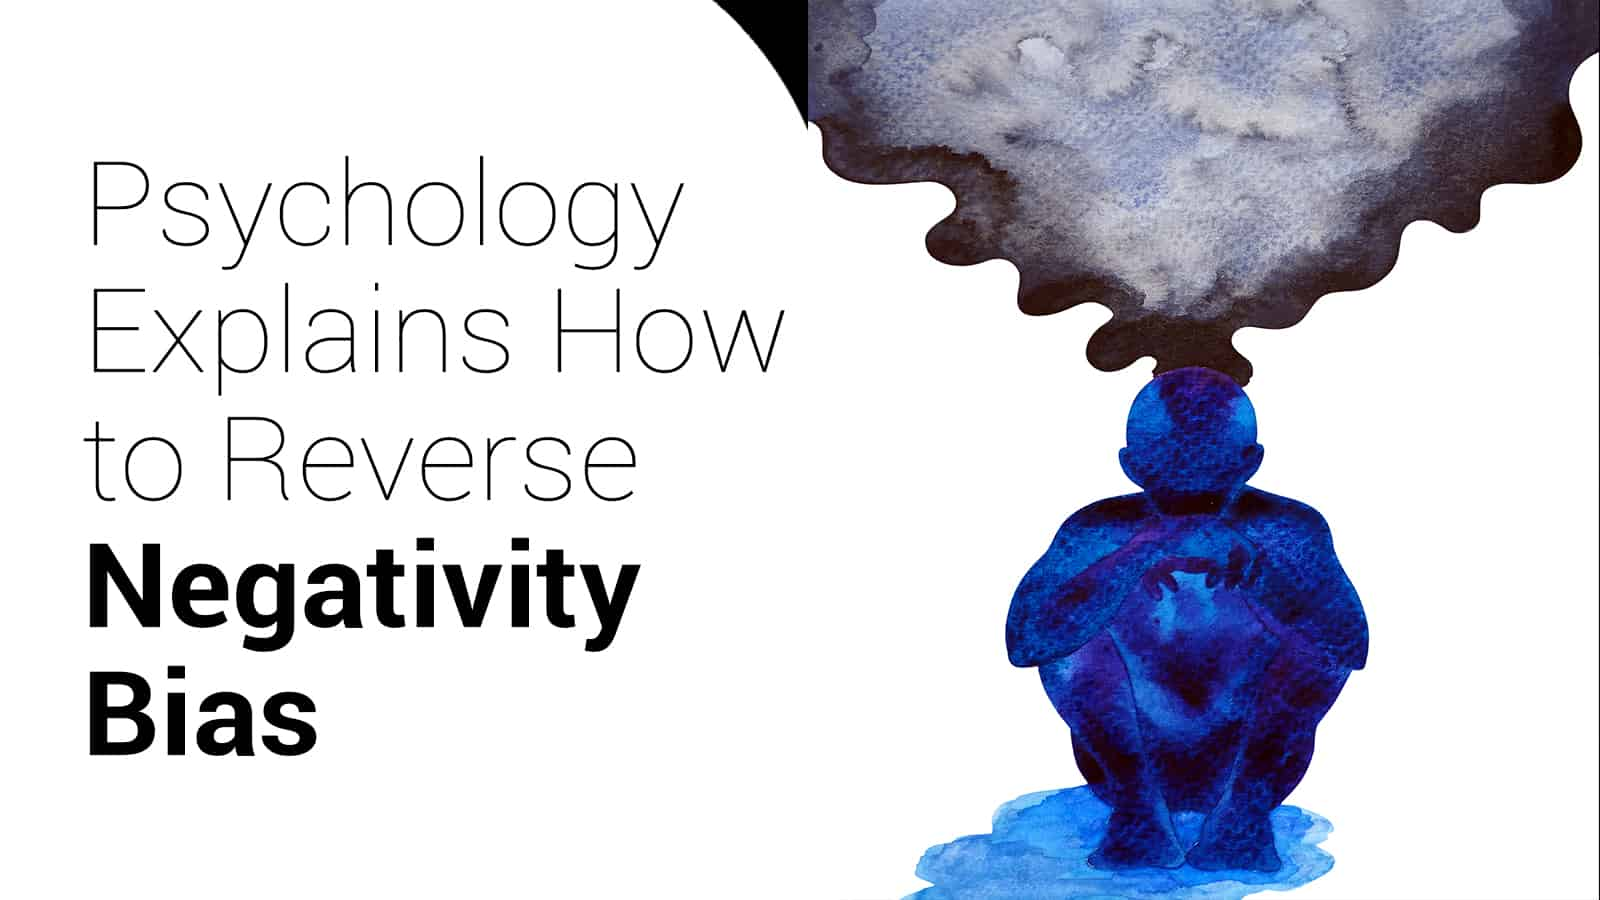 Psychology Explains How to Reverse Negativity Bias